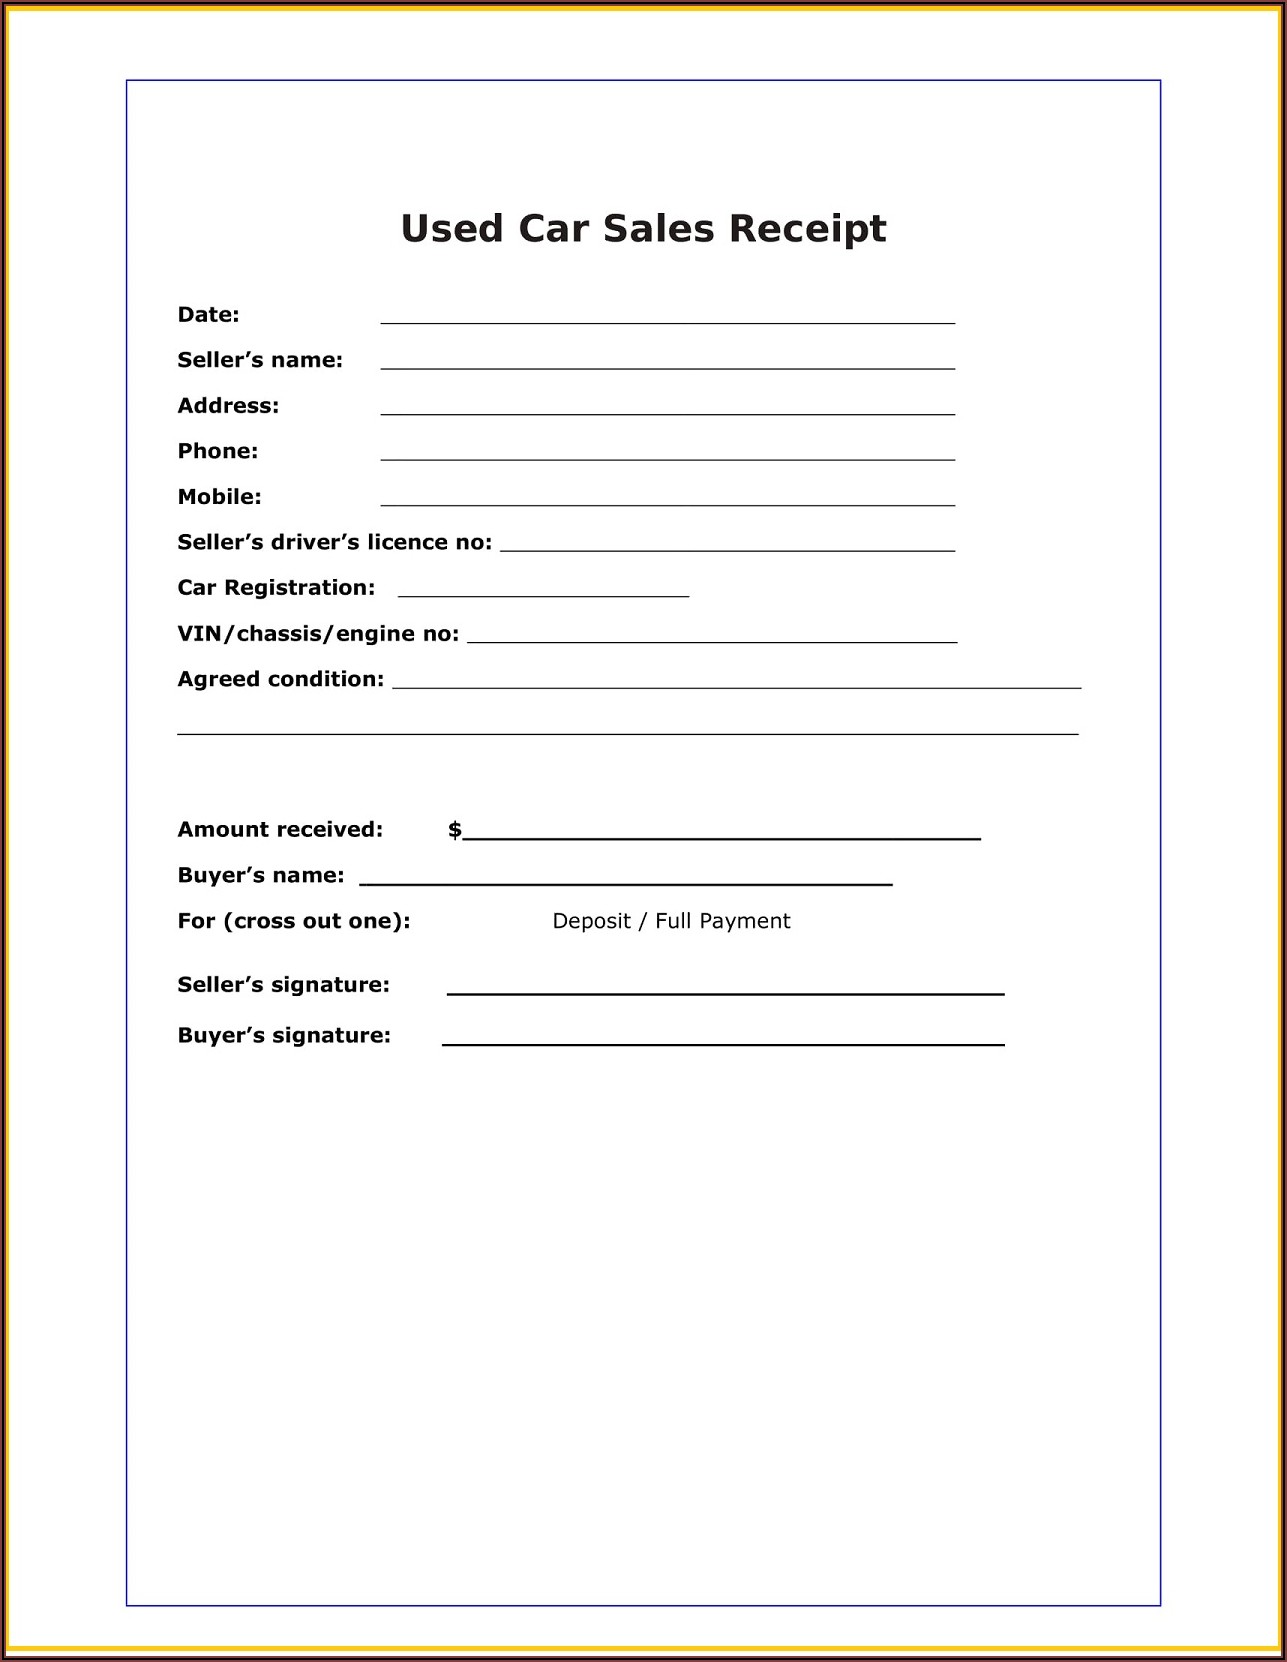 Used Car Sales Receipt Form